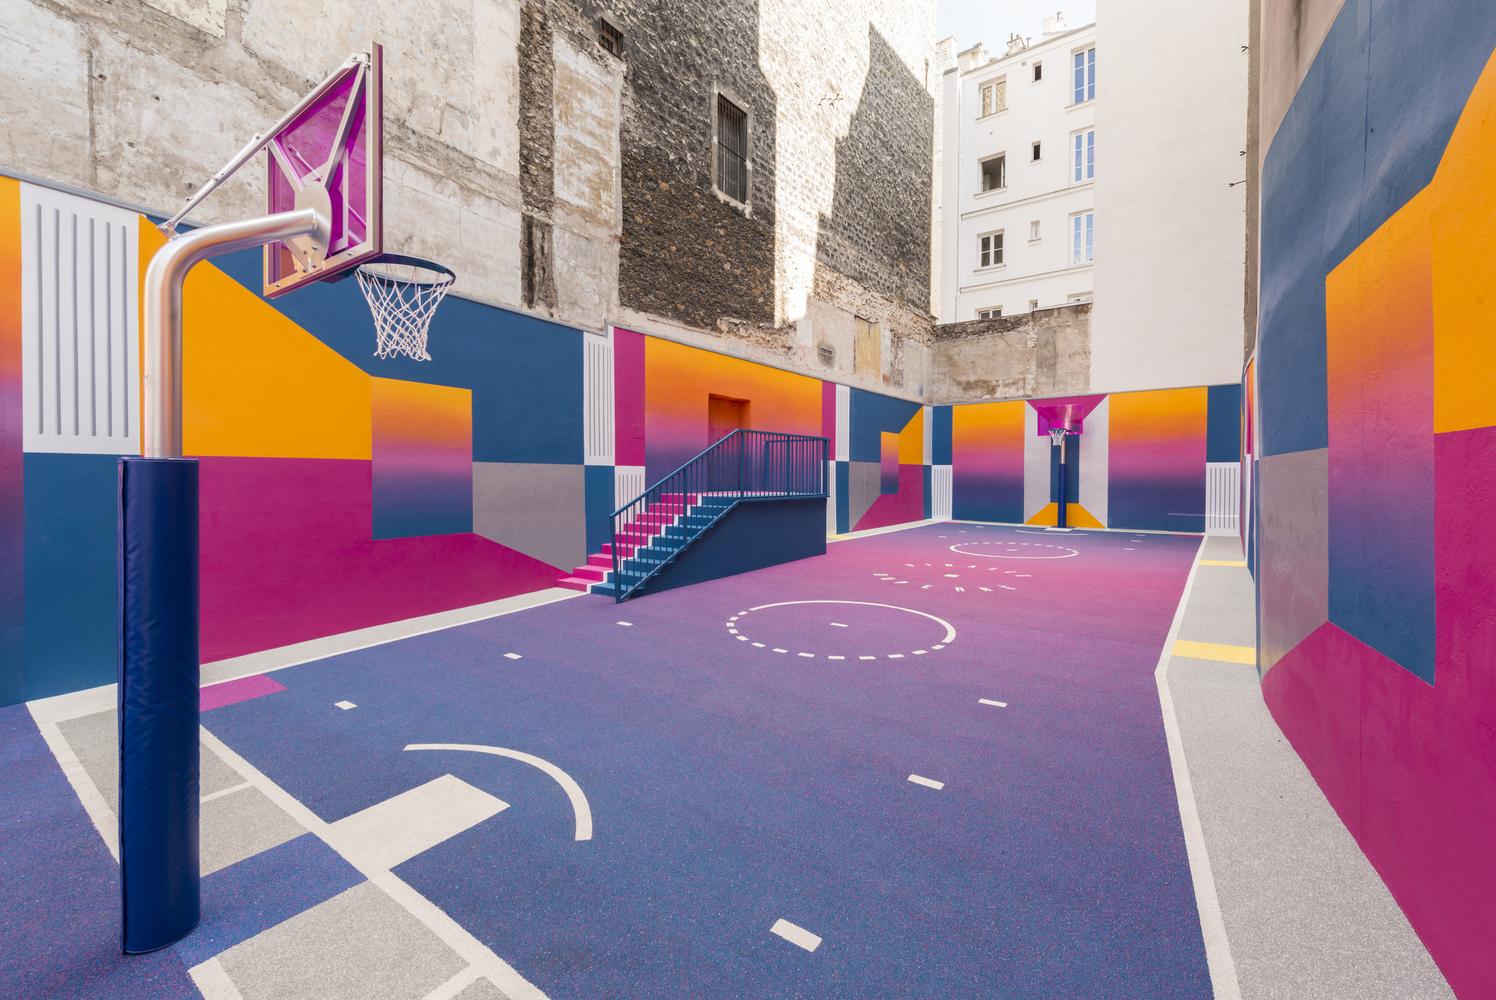 Imagen actual de la cancha de la Rue de Duperrè / Fotos: SuperBasket Canarias